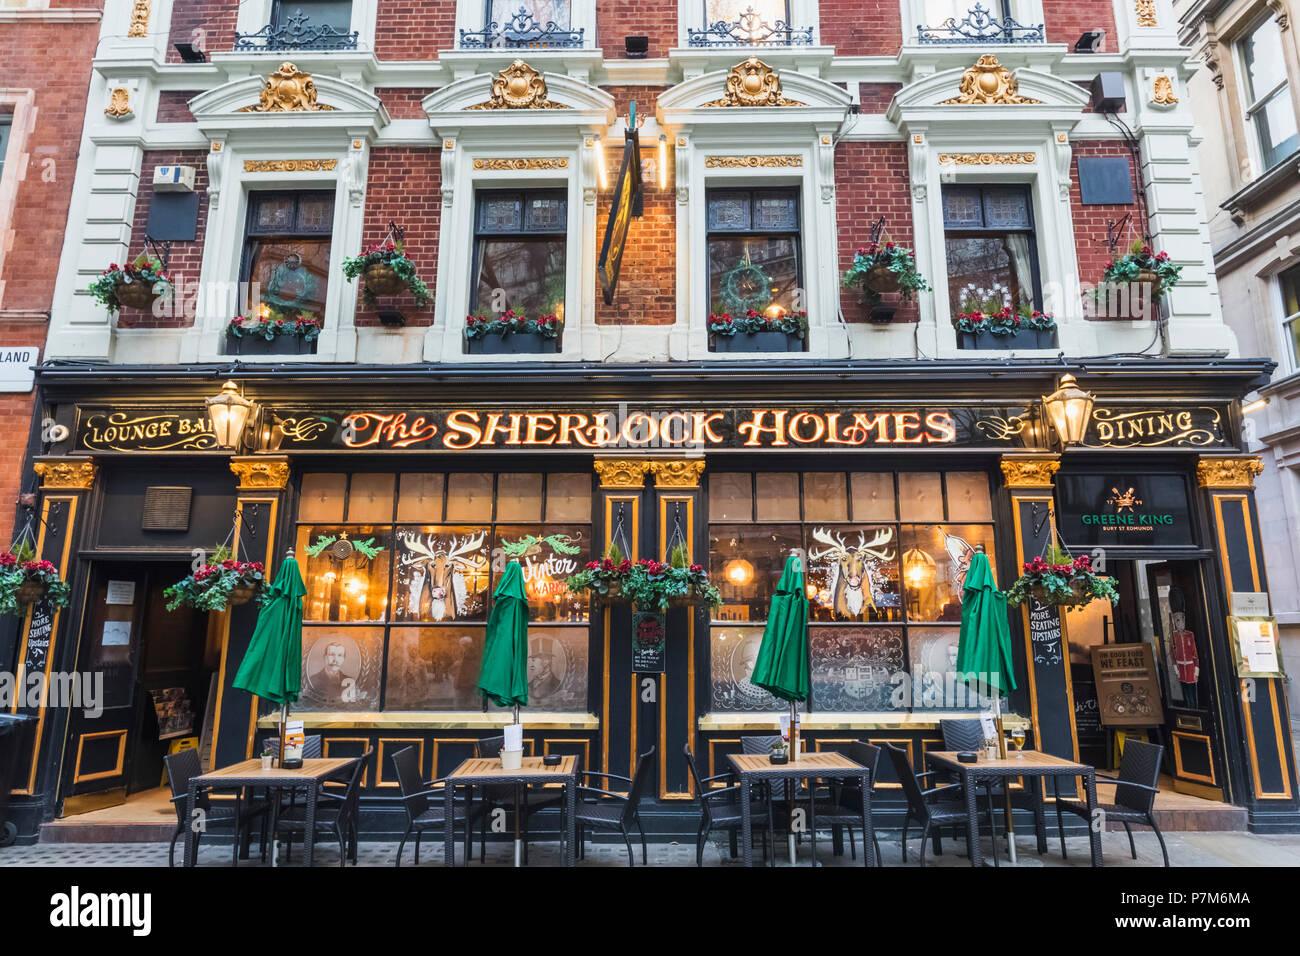 England, London, Embankment, The Sherlock Holmes Pub - Stock Image